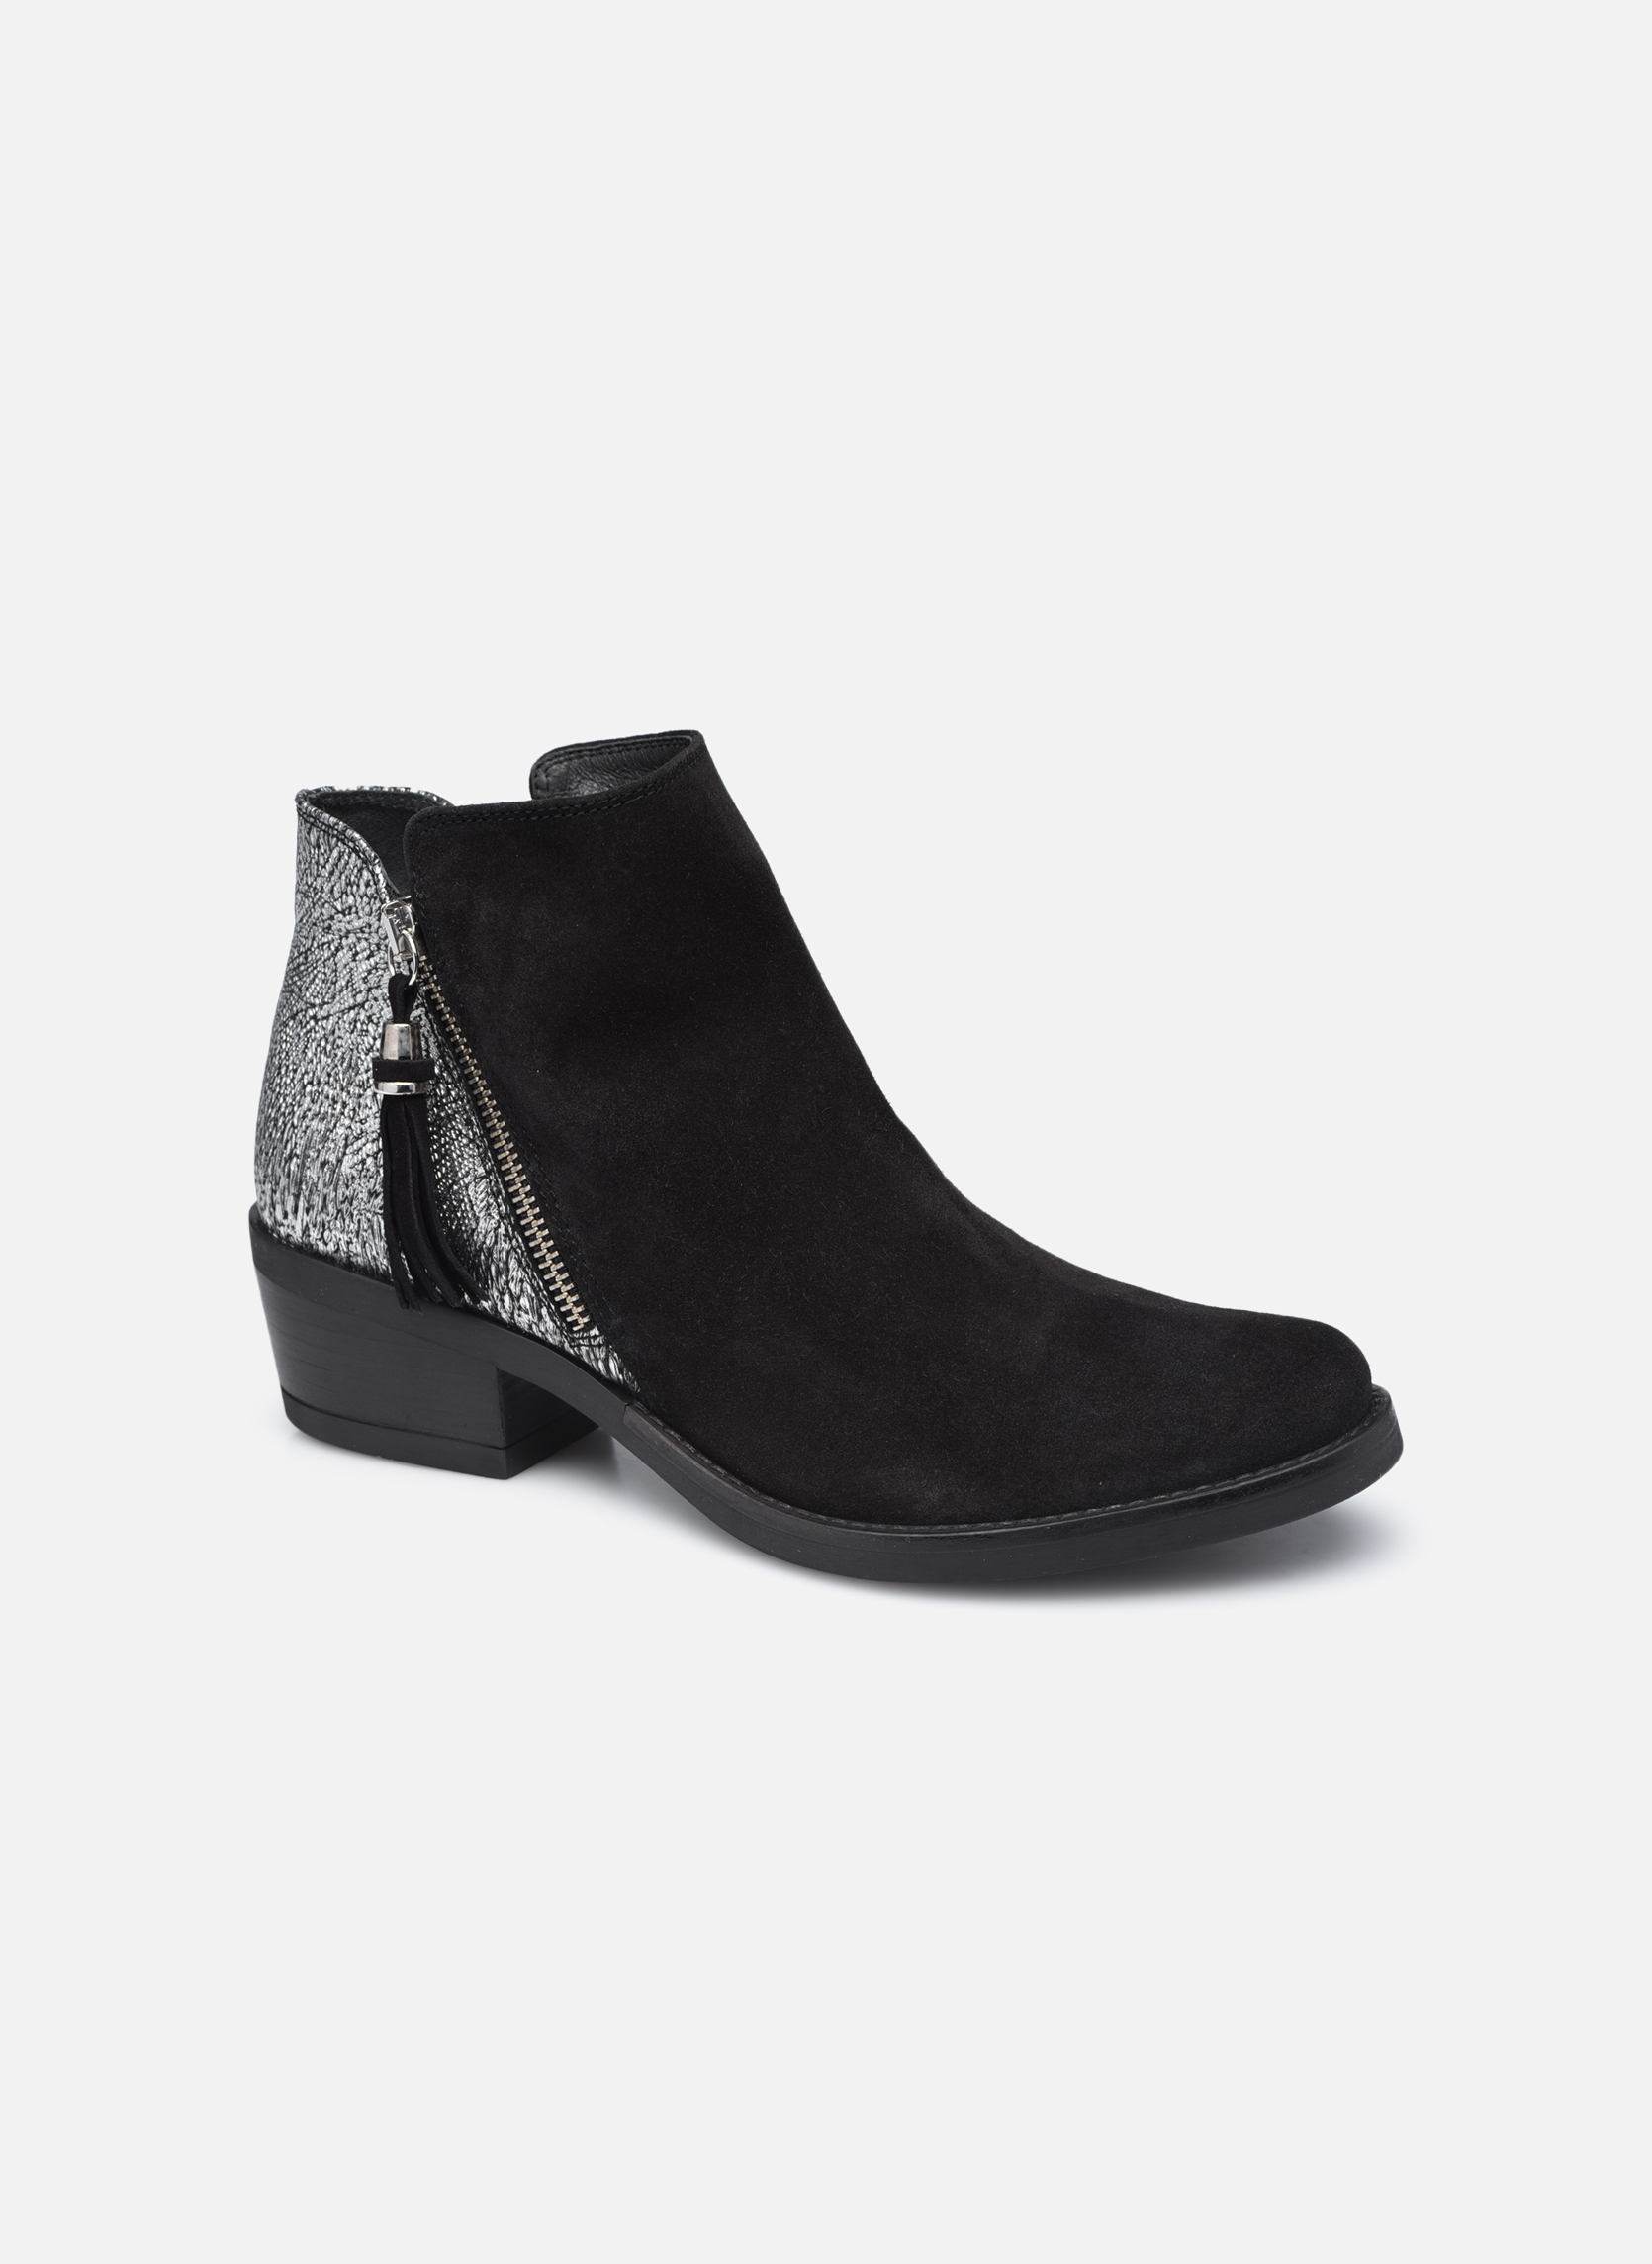 Boots en enkellaarsjes Kanna Zwart